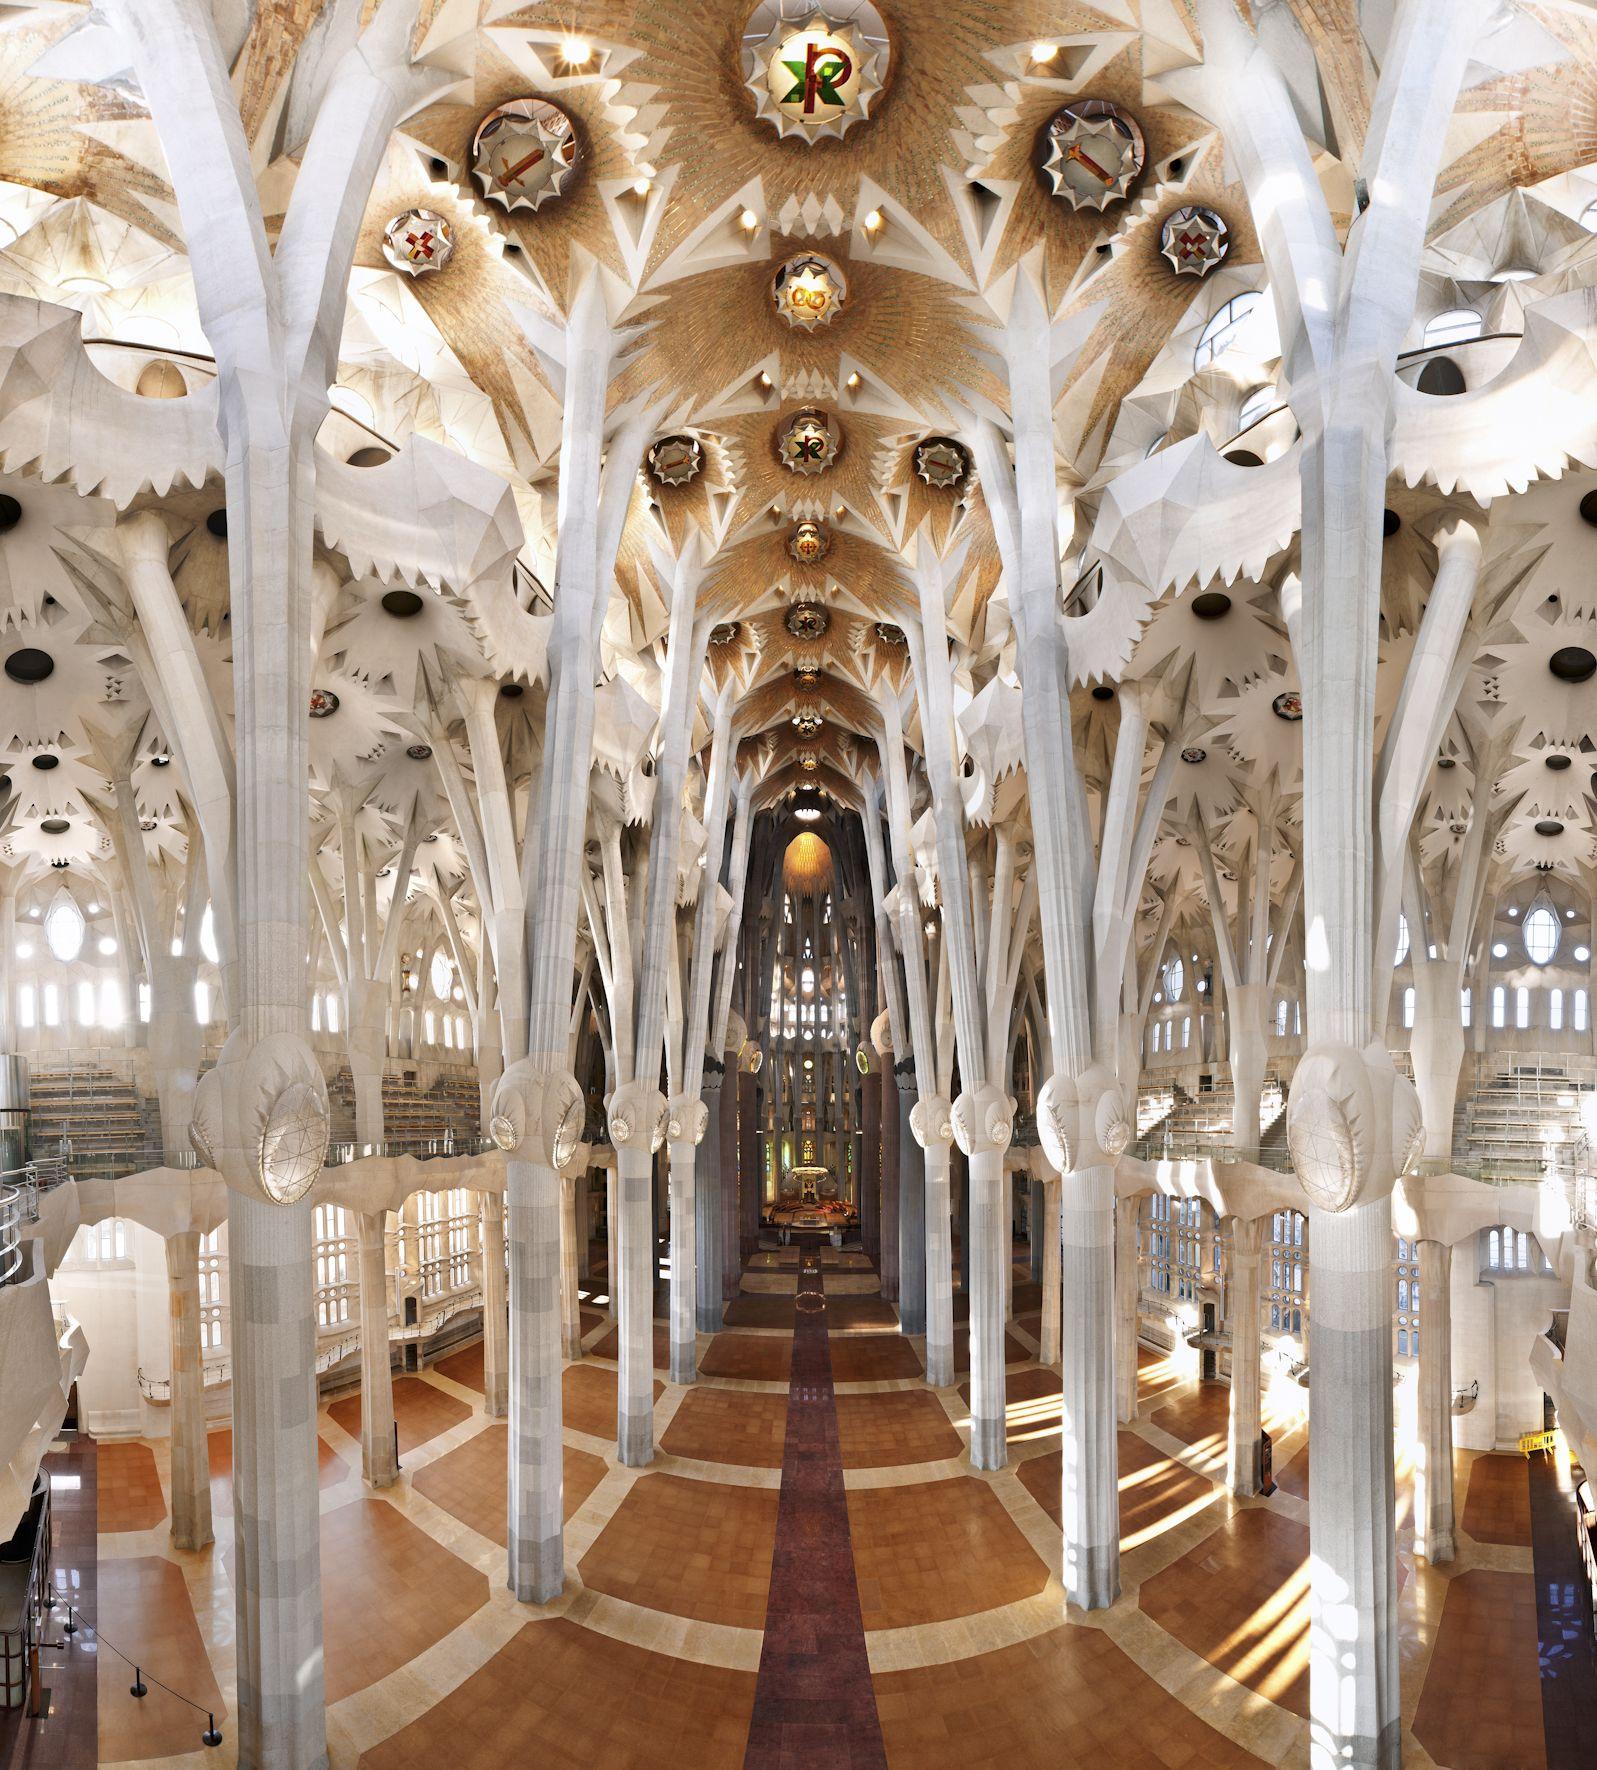 Sagrada fam lia interior i could look at this for days - Sagrada familia interieur ...